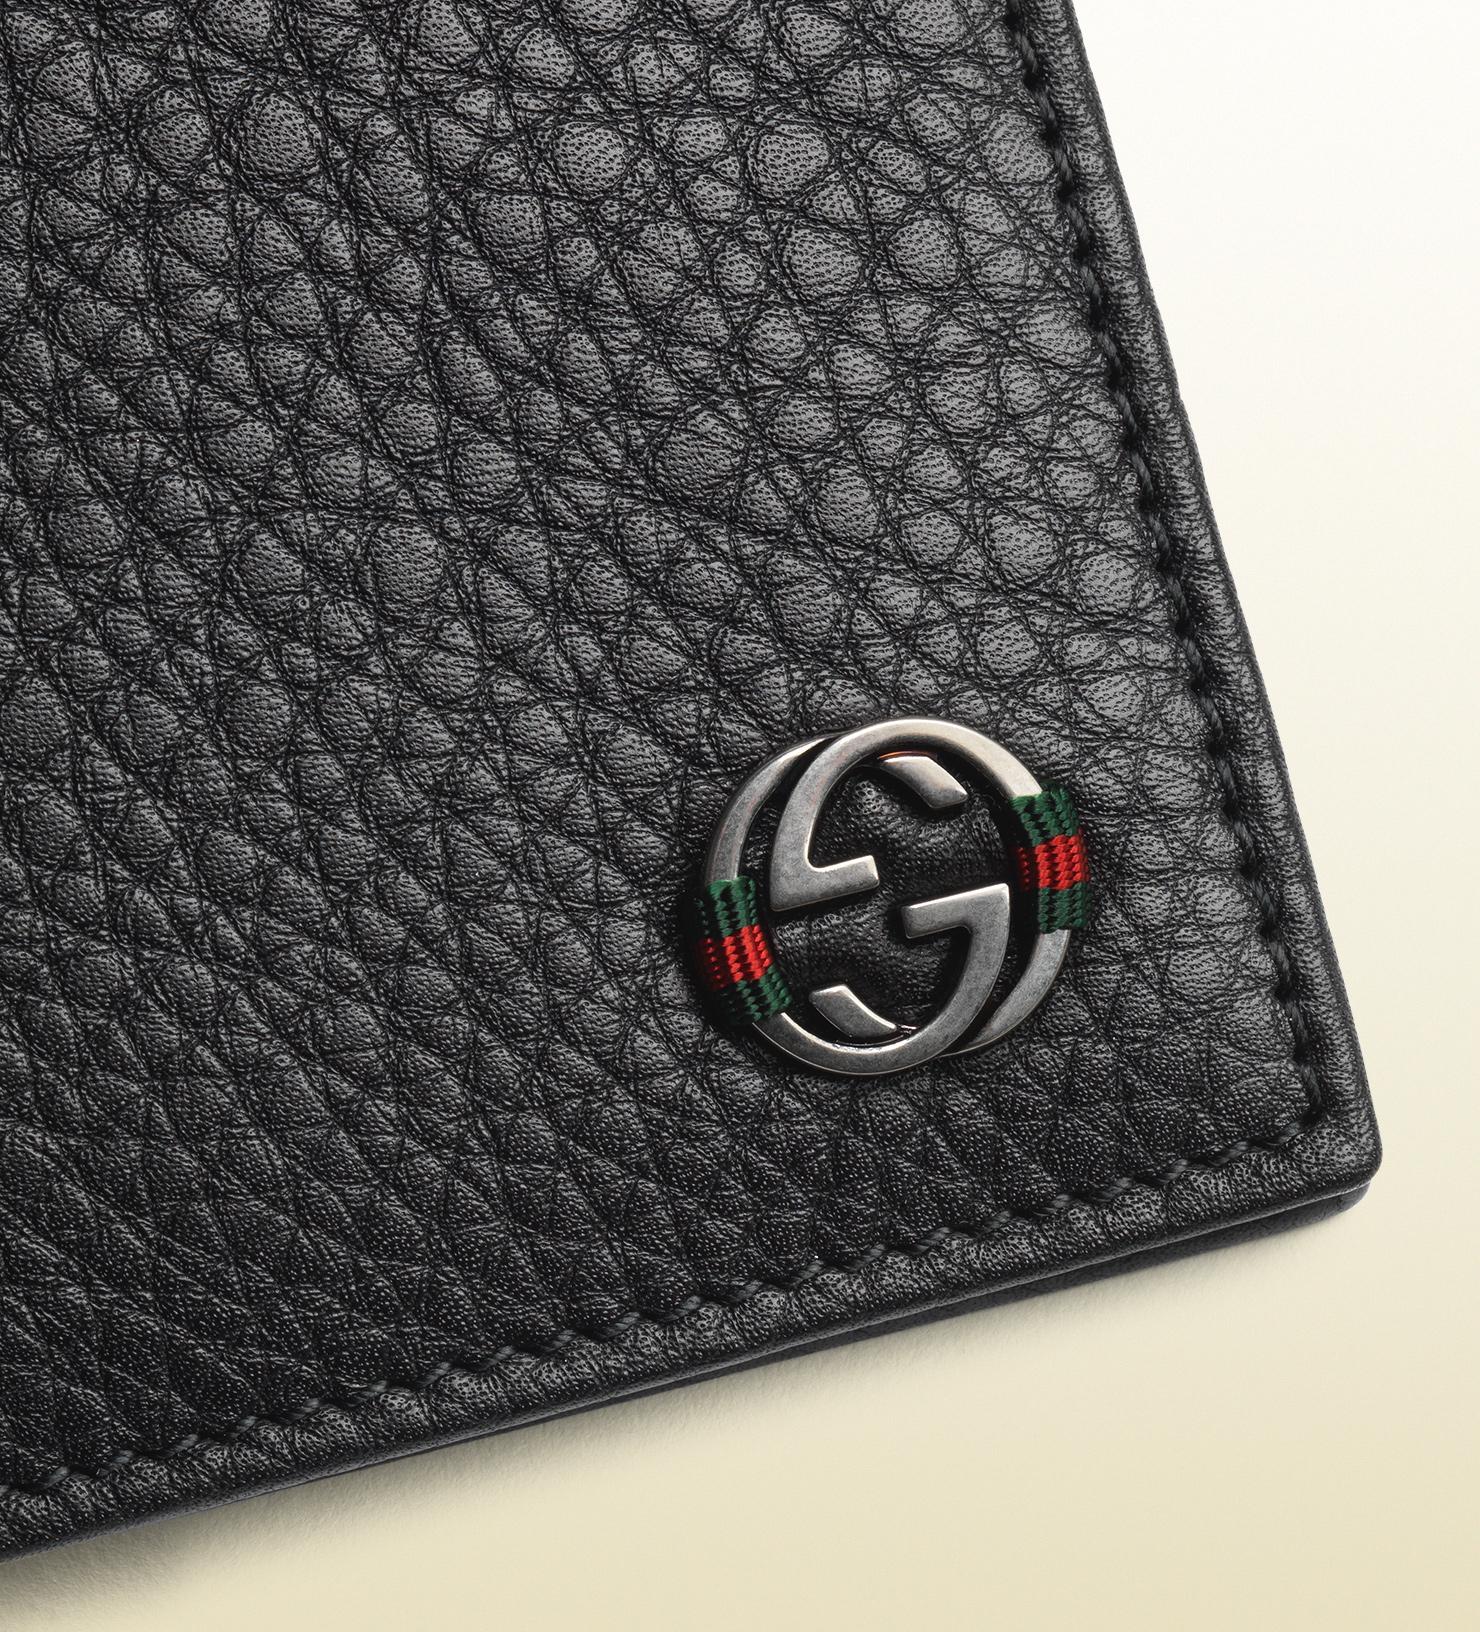 f091e0ee640 Lyst - Gucci Leather Bi-fold Wallet in Black for Men